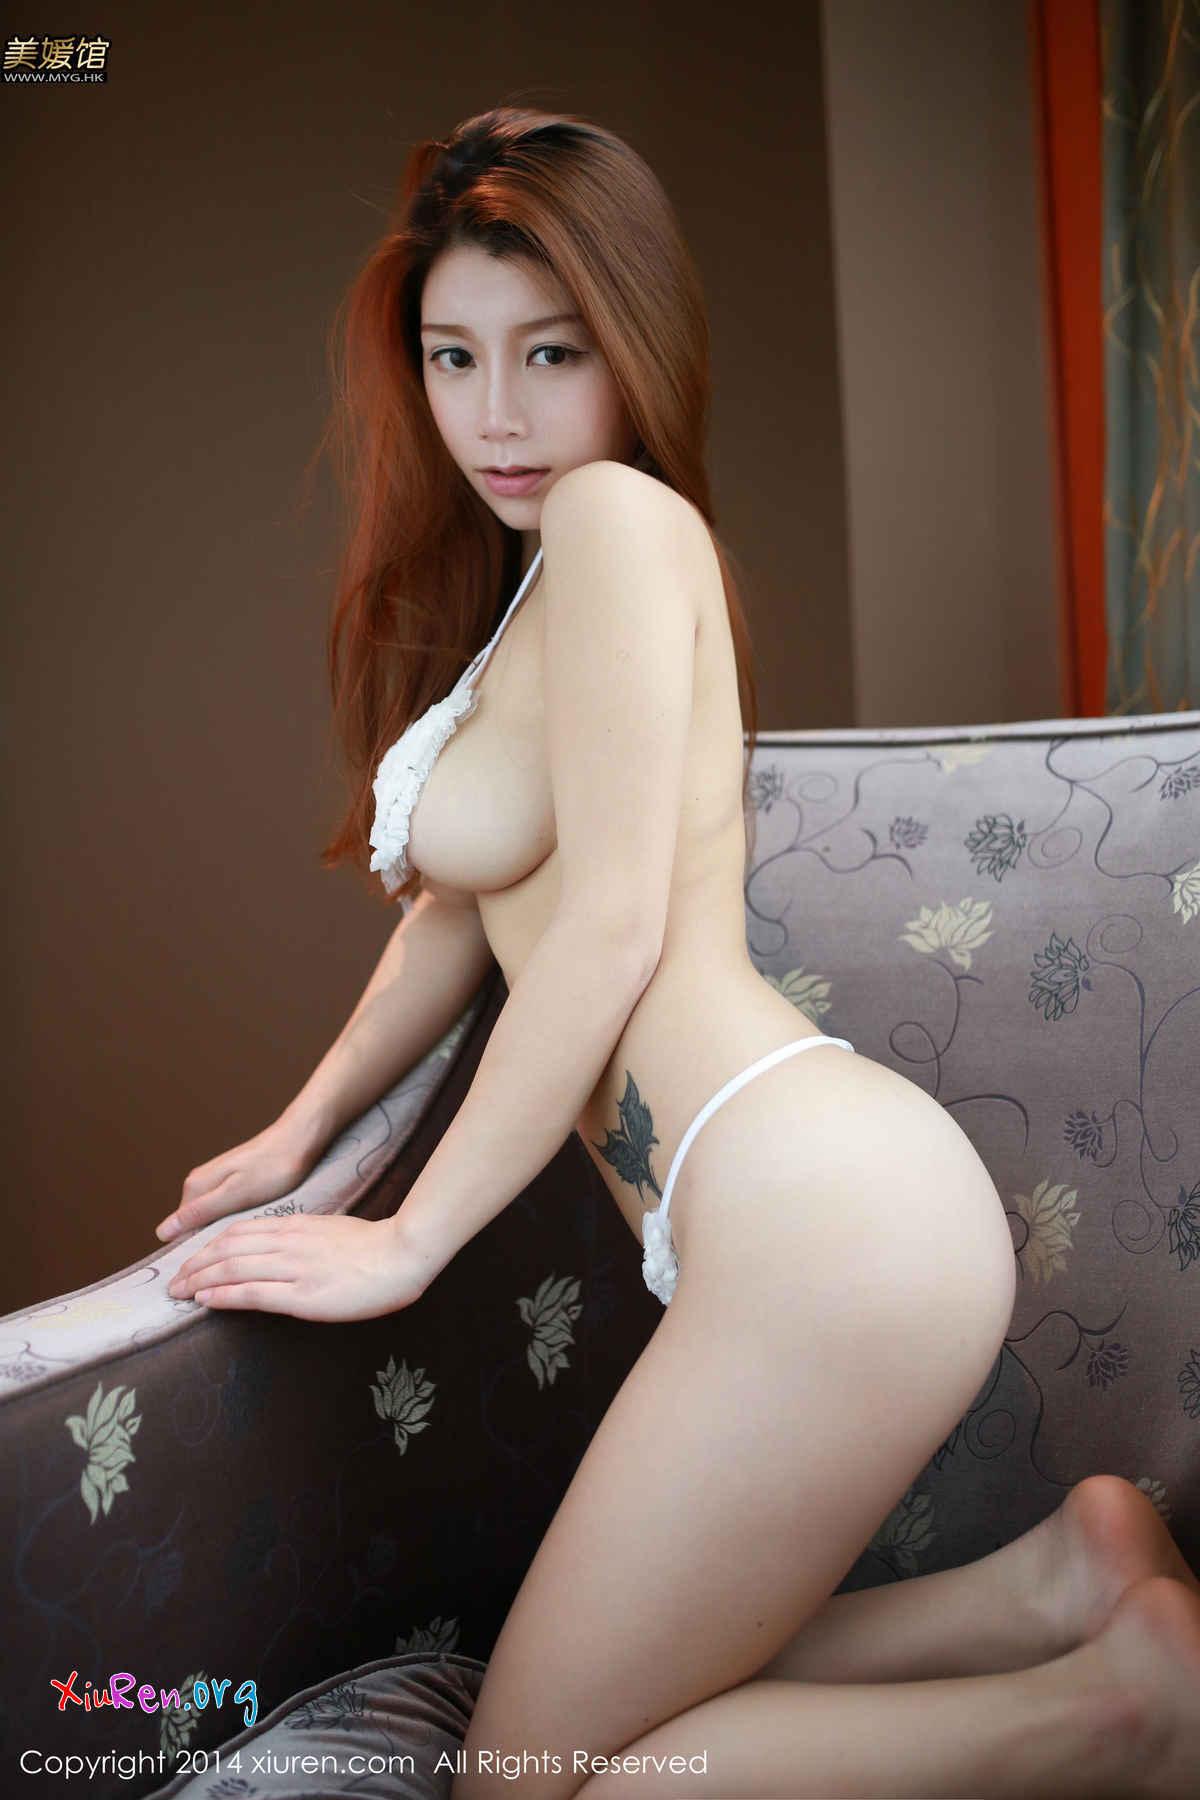 phimvu blog-XiuRen-N00124-vetiver-0043.jpg